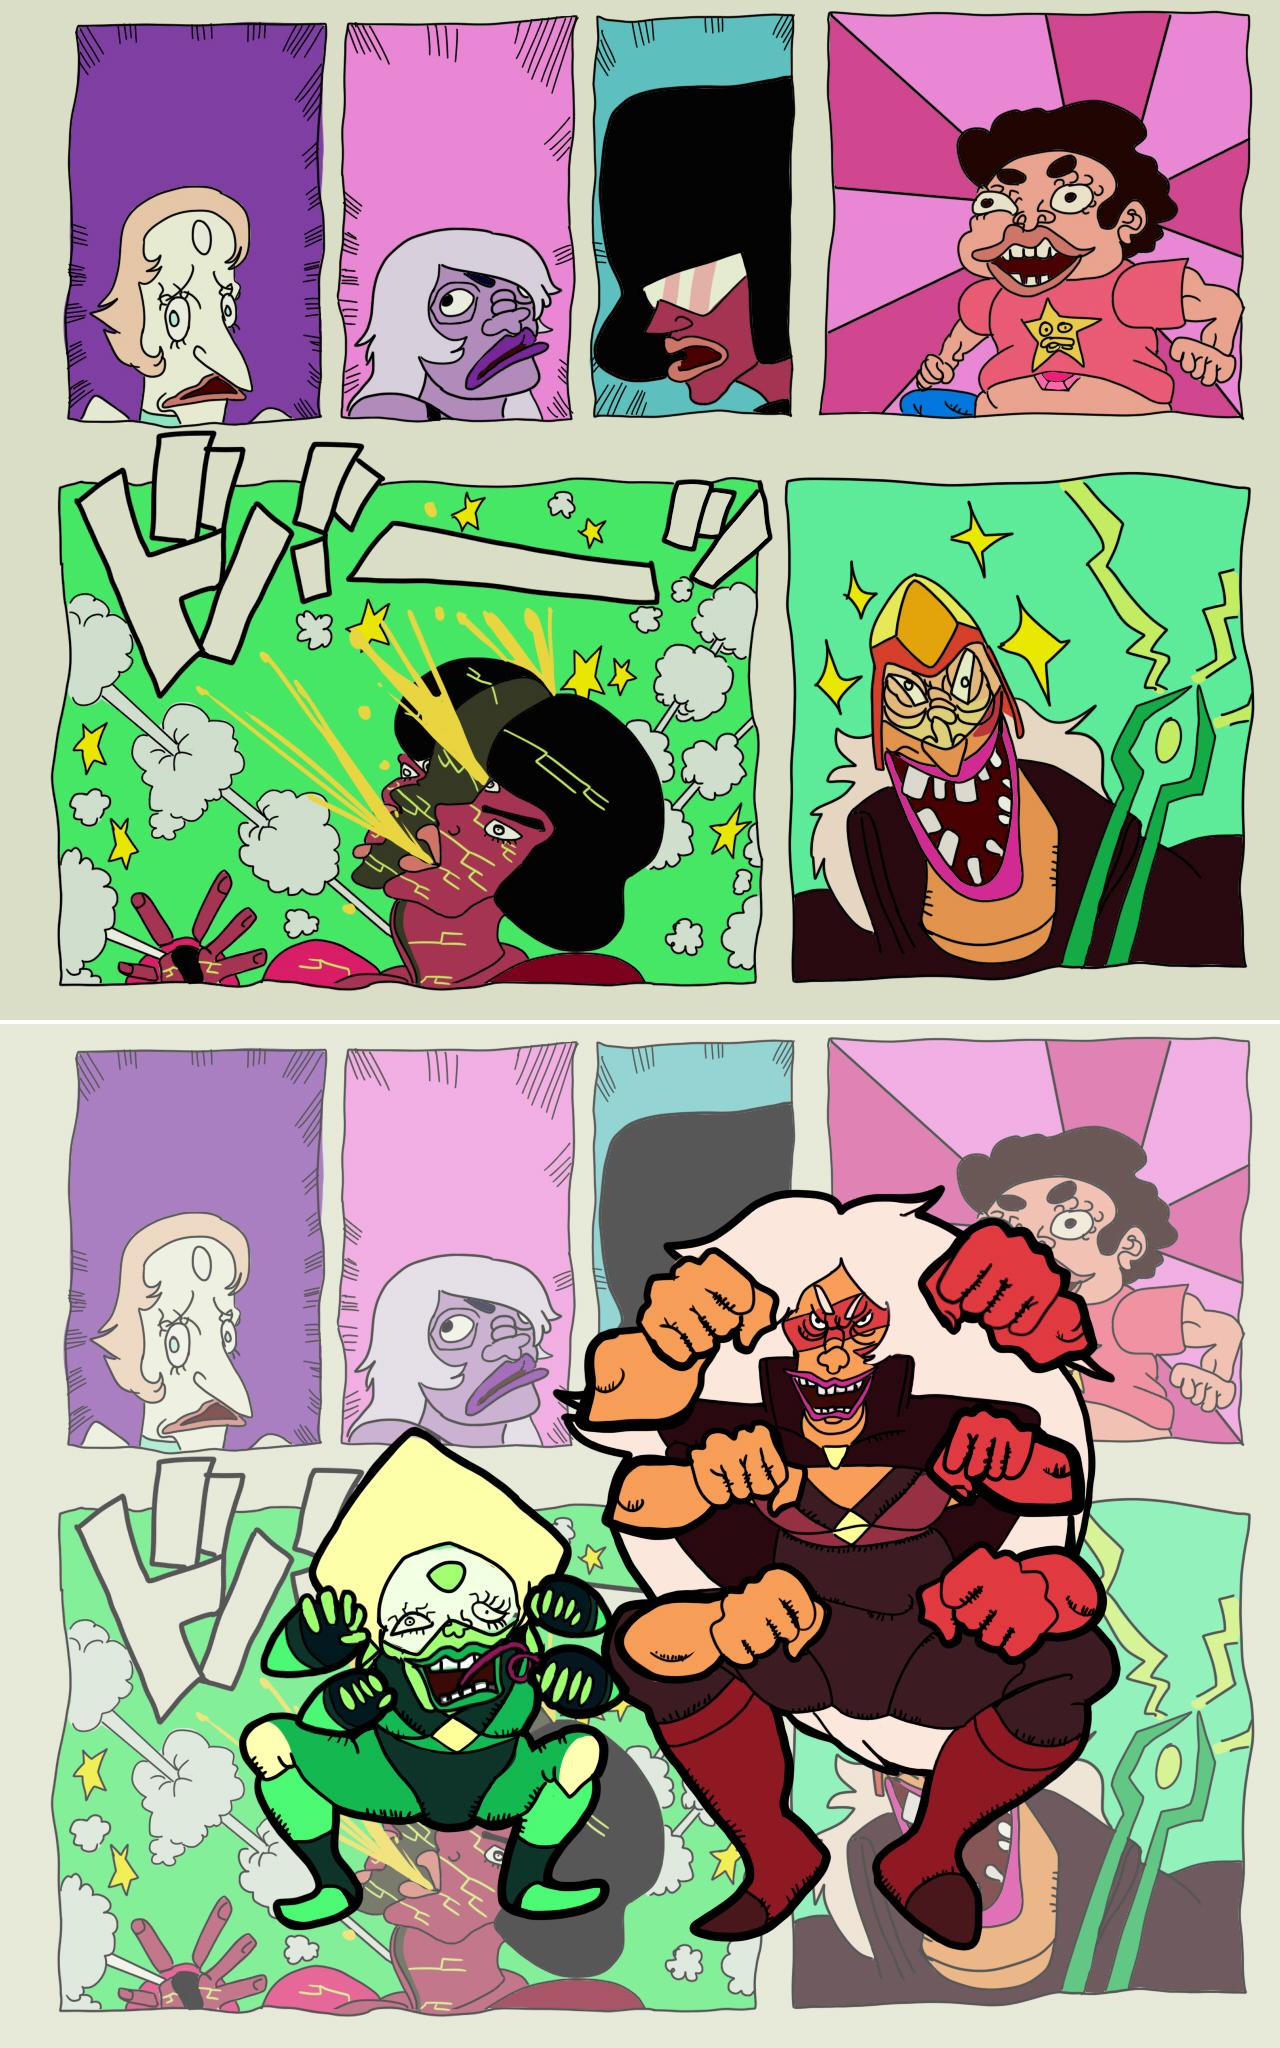 SHINJITERU ZE! | Steven Universe | Know Your Meme